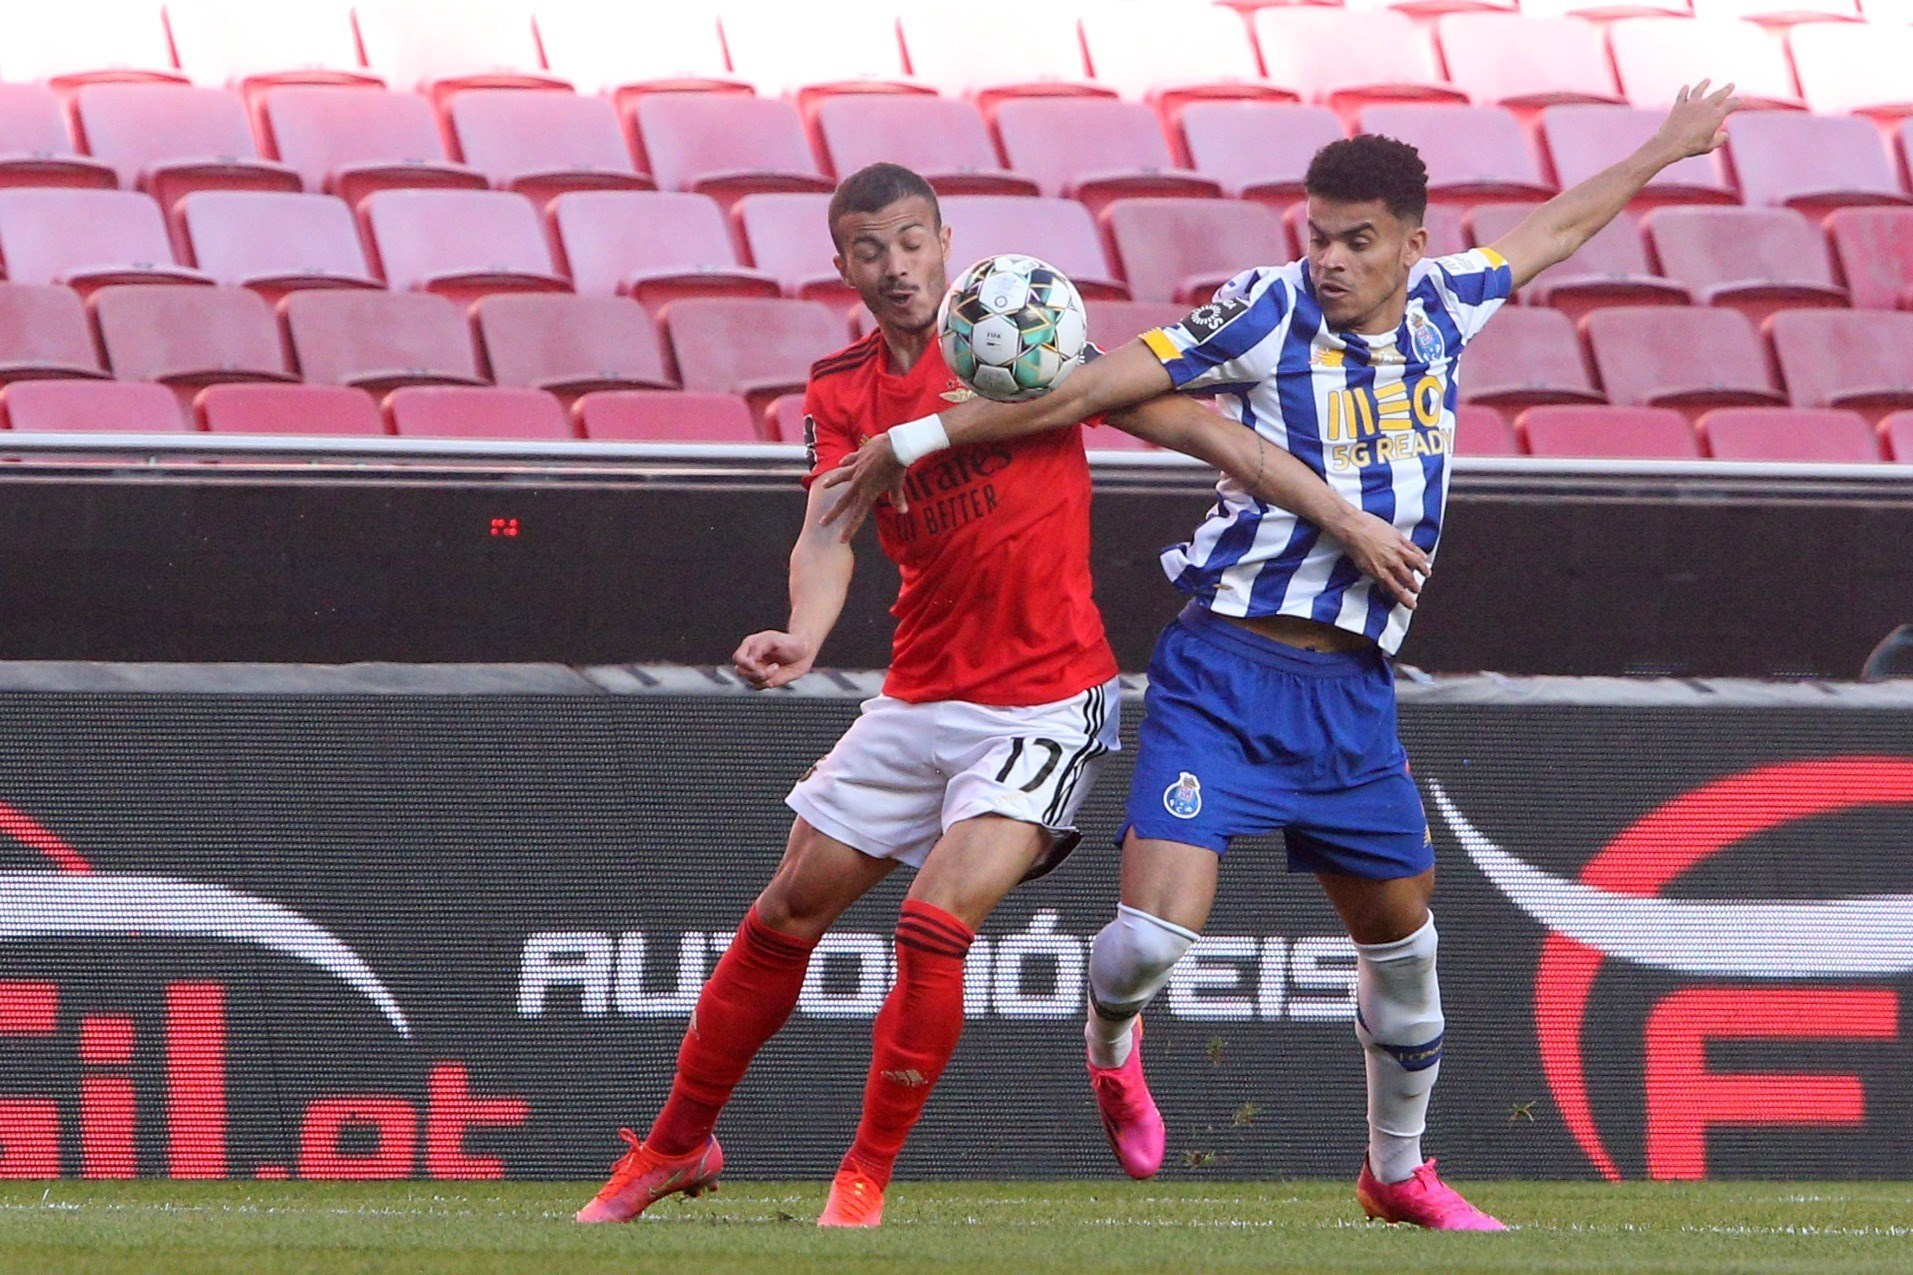 لیگ برتر پرتغال| تساوی پورتو در خانه بنفیکا